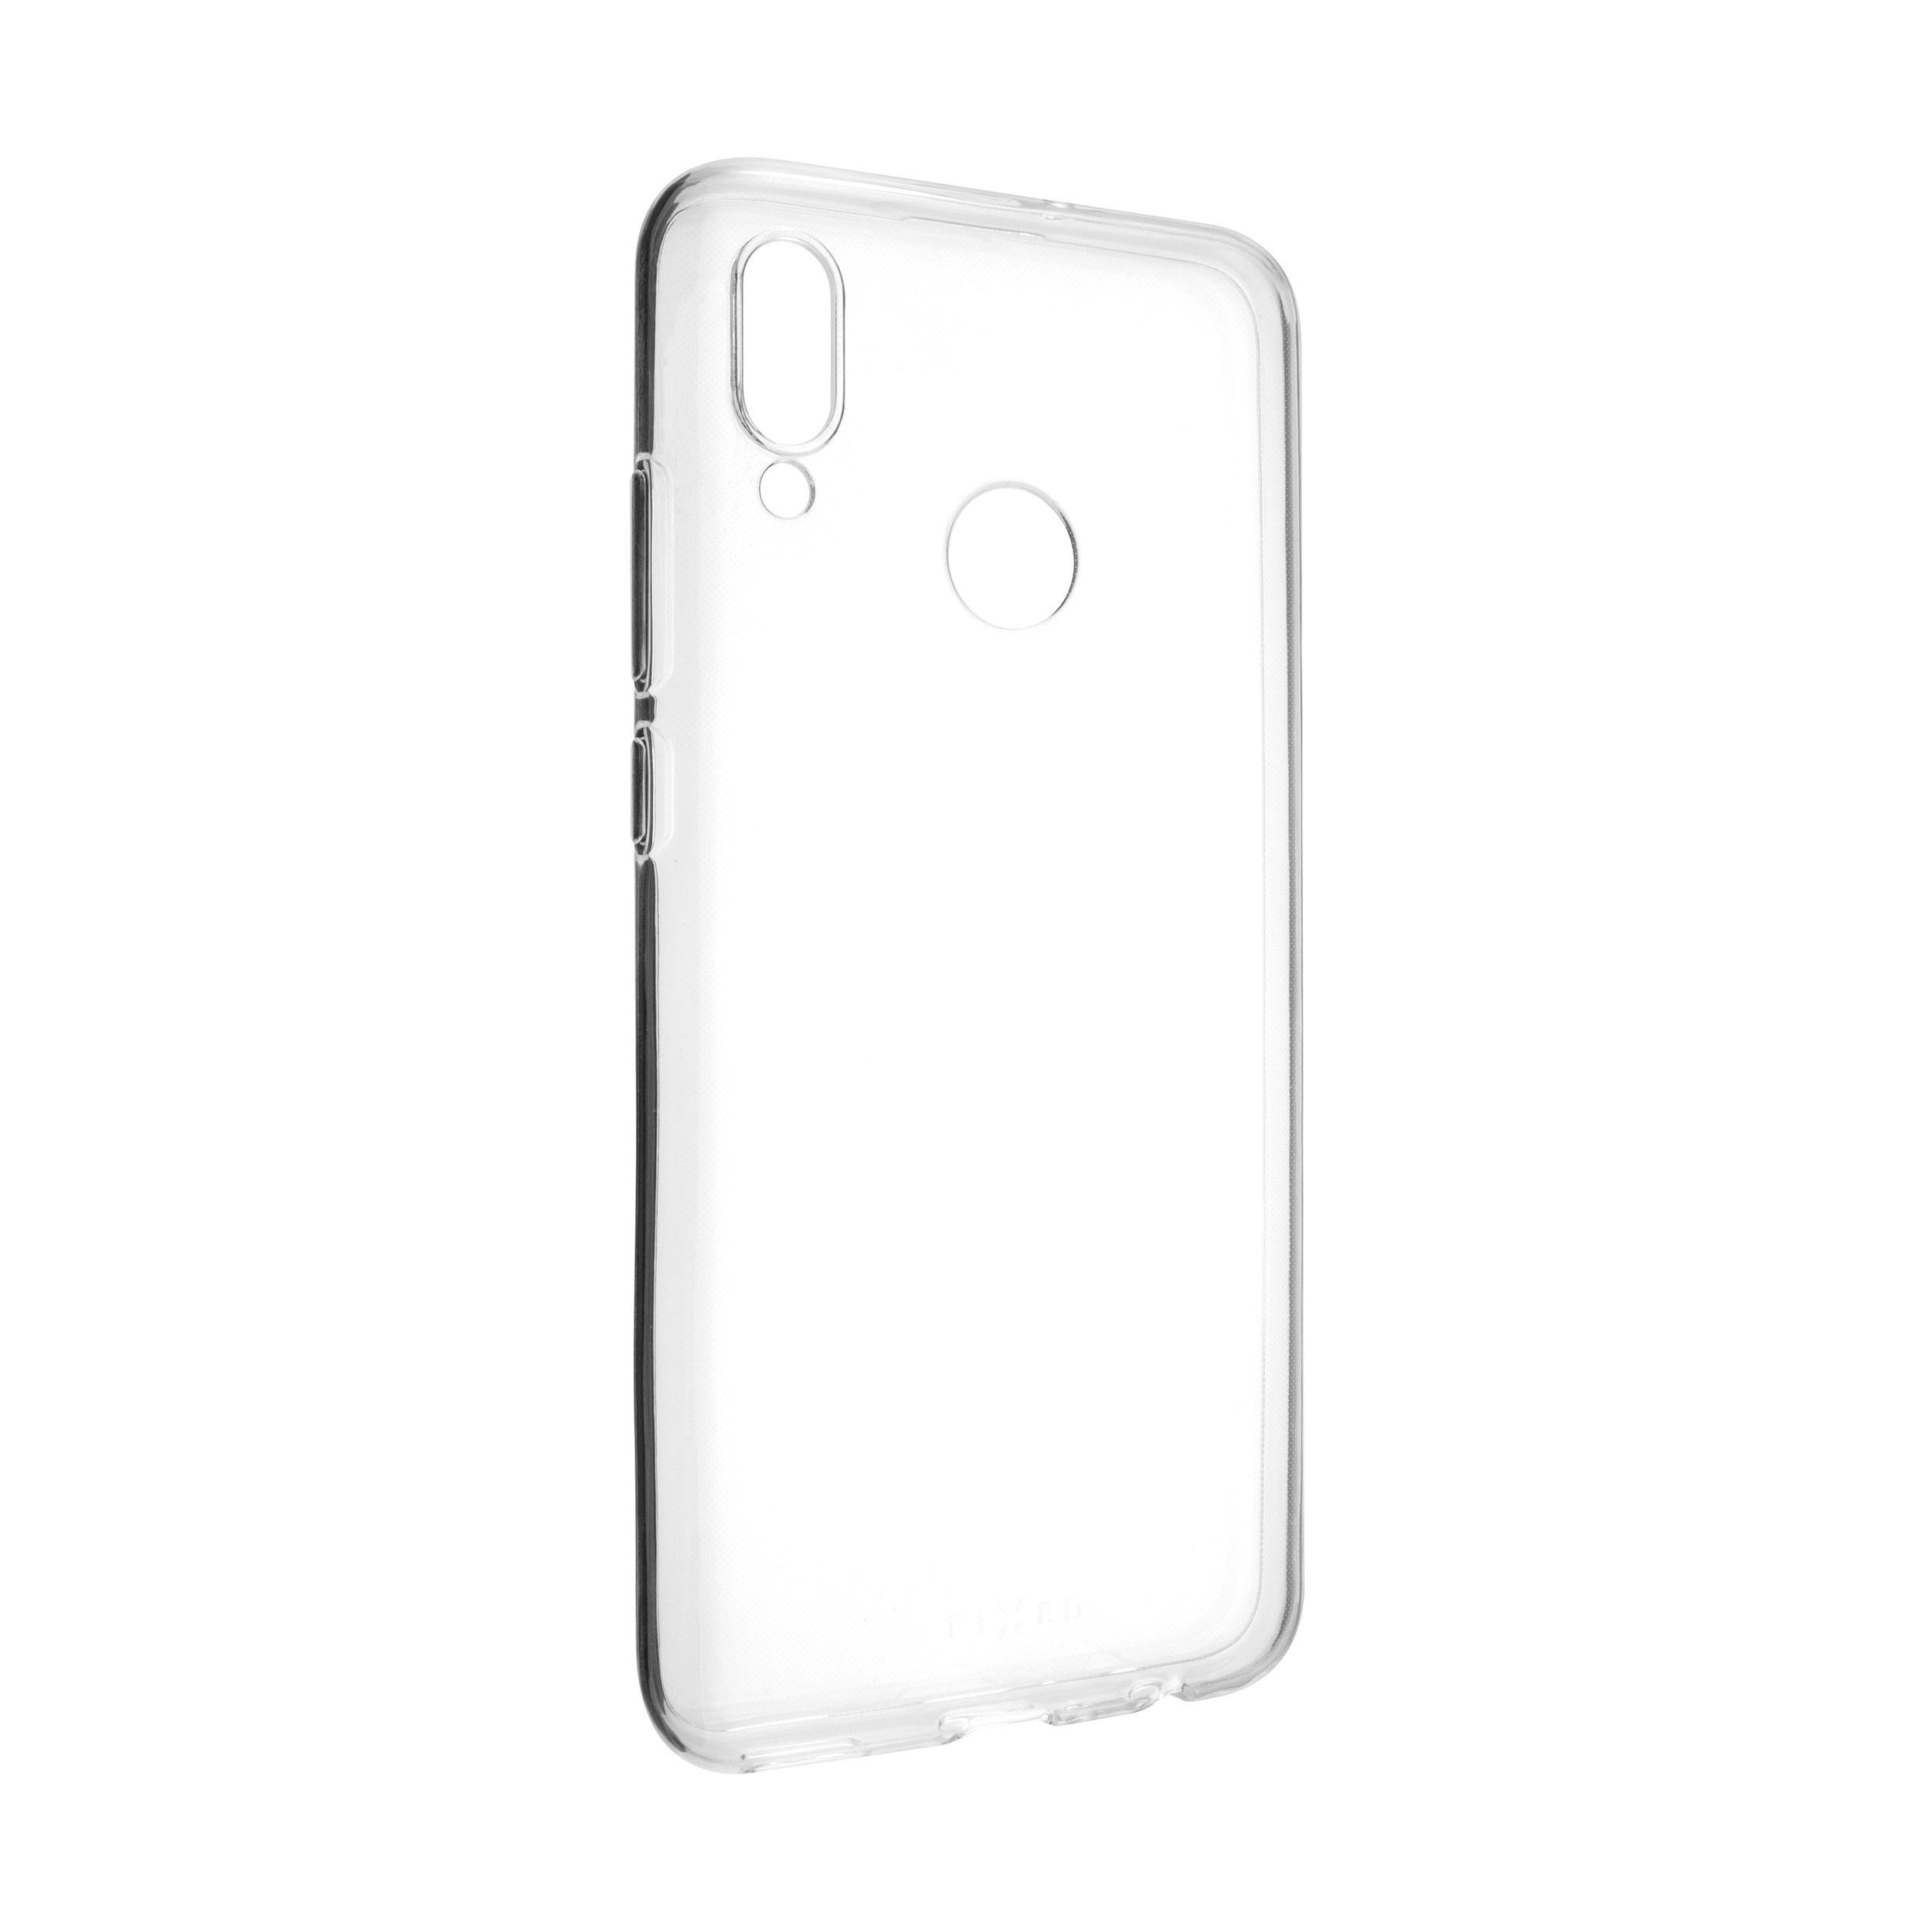 Ultratenké TPU gelové pouzdro FIXED Skin pro Huawei P Smart (2019), 0,6 mm, čiré